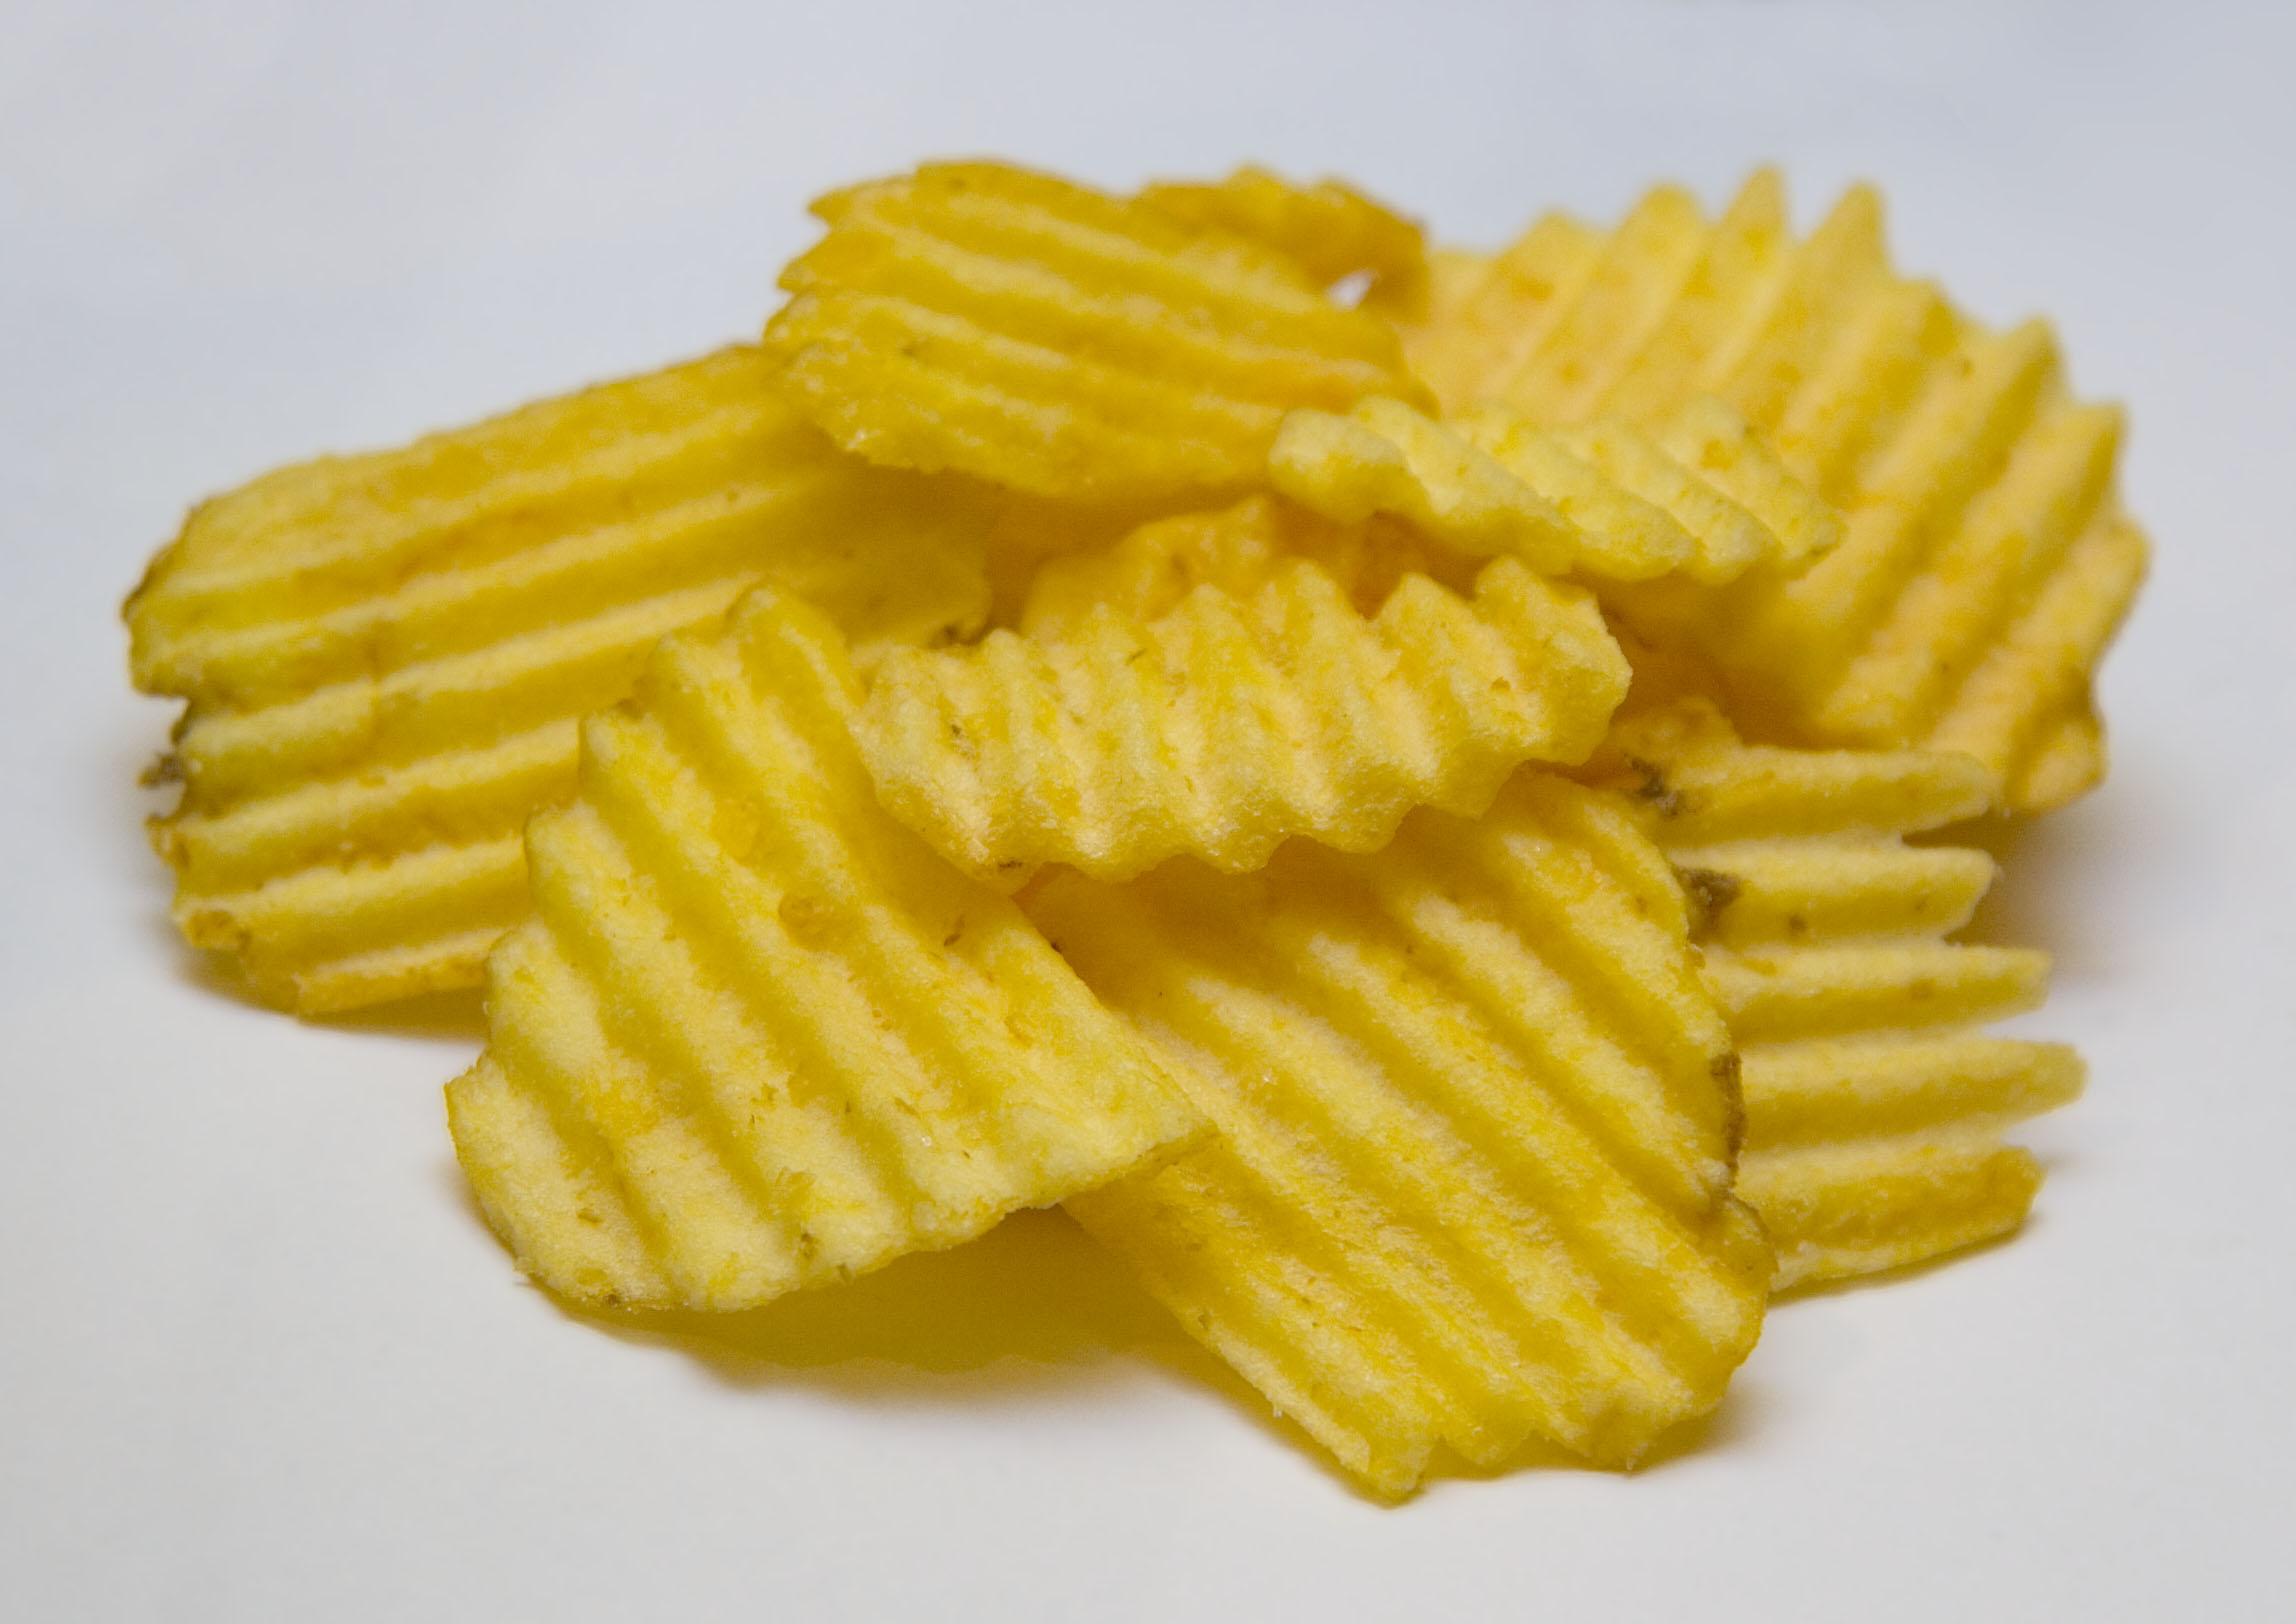 File:McCoy's Crisps.jpg - Wikimedia Commons